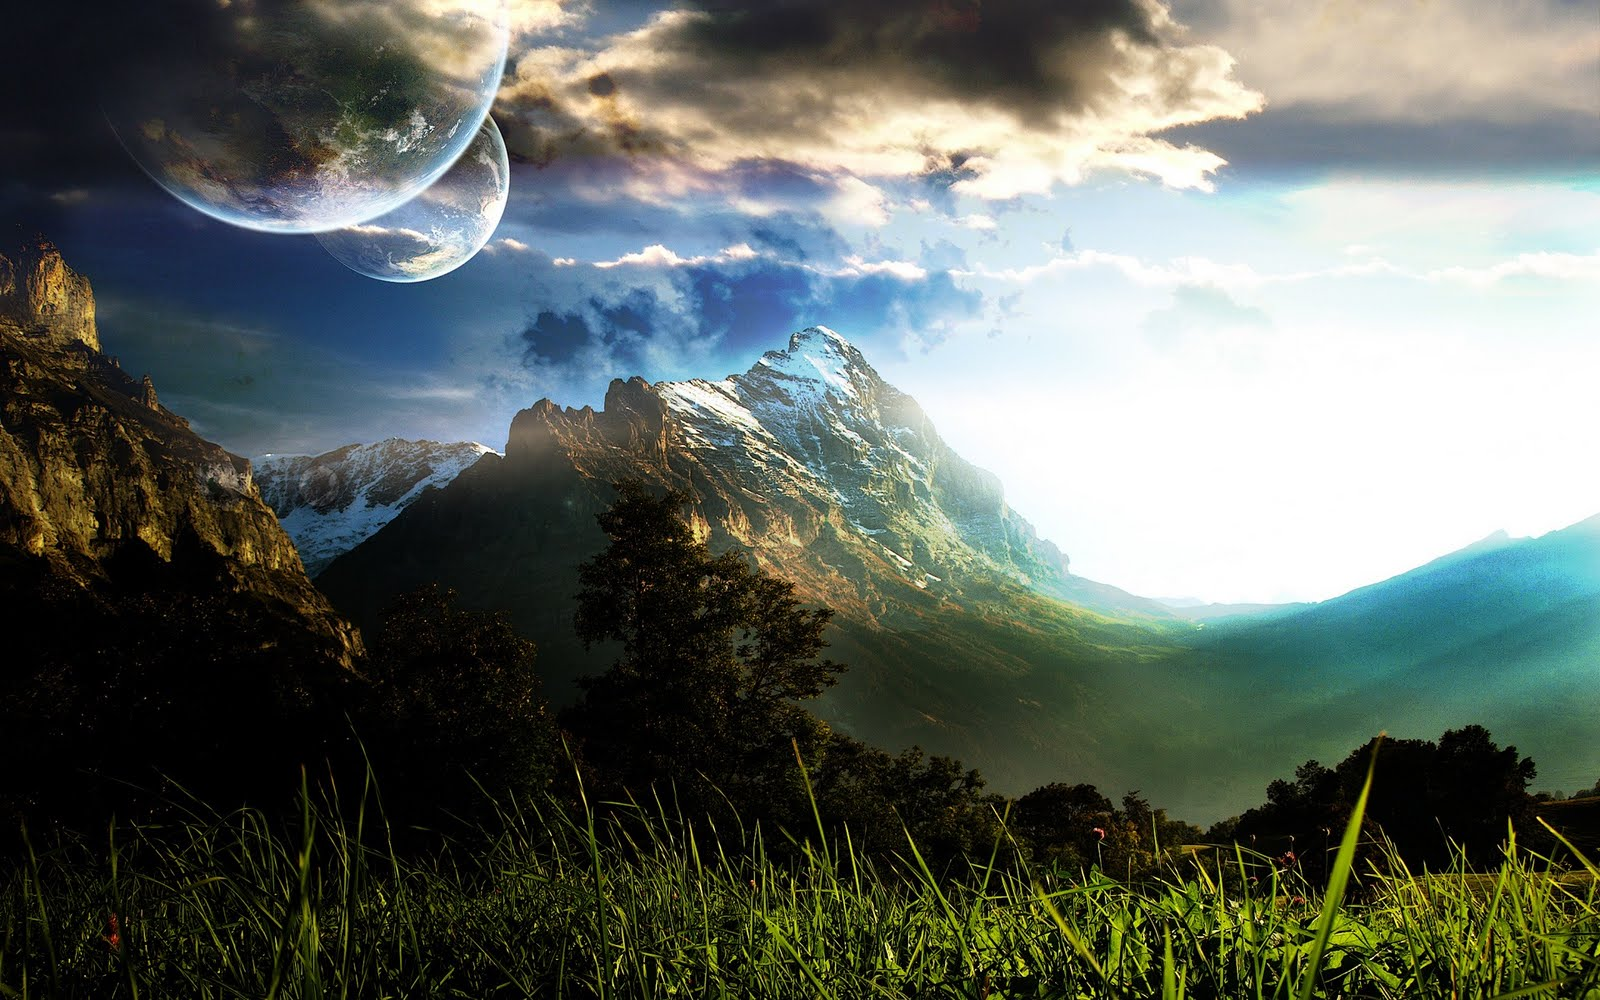 epic nature wallpaper - photo #18